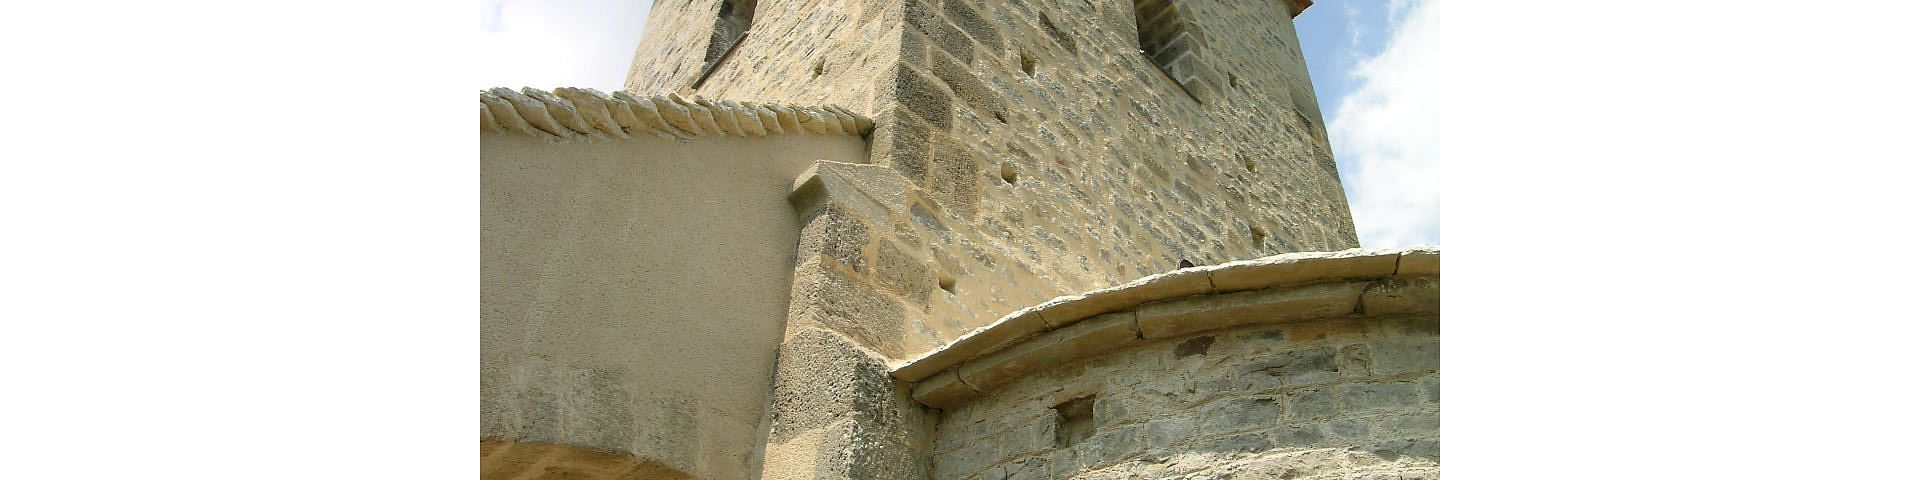 Burzy - Eglise Ste-Foy (71)